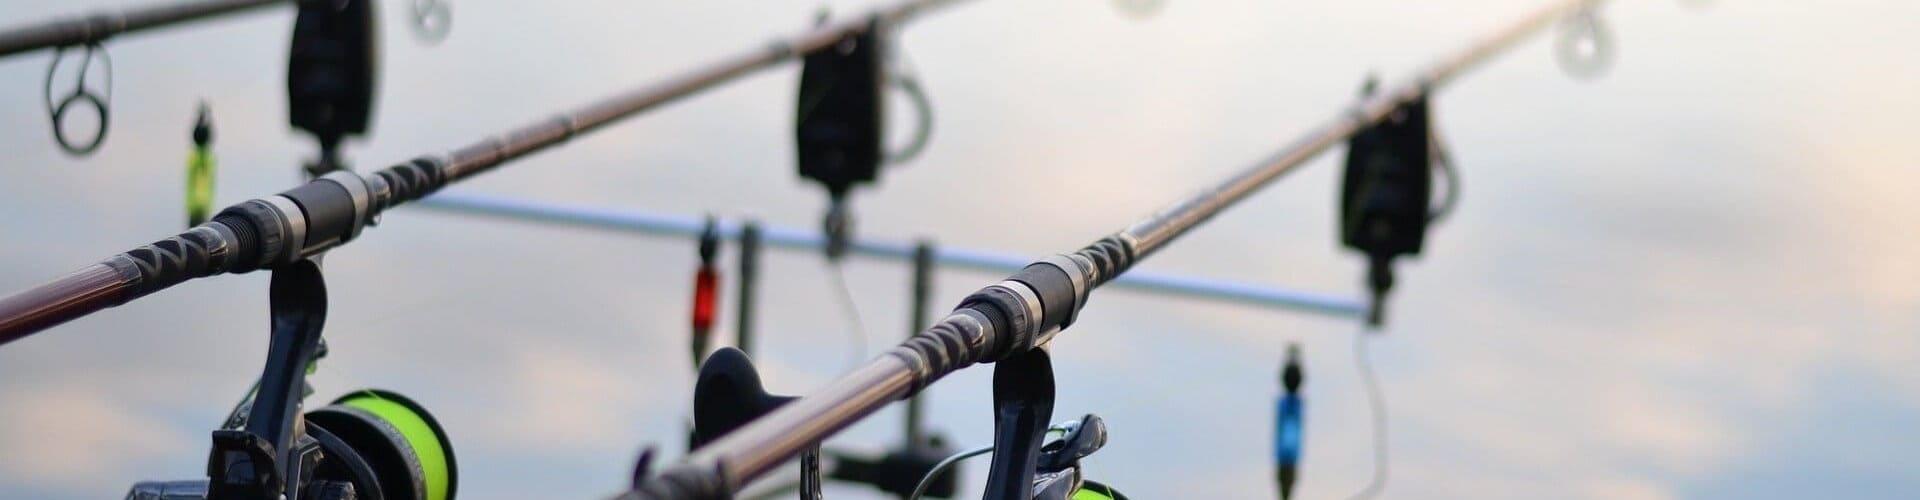 Ruten von Hearty Rise und Bullseye Fishing neu im Sortiment